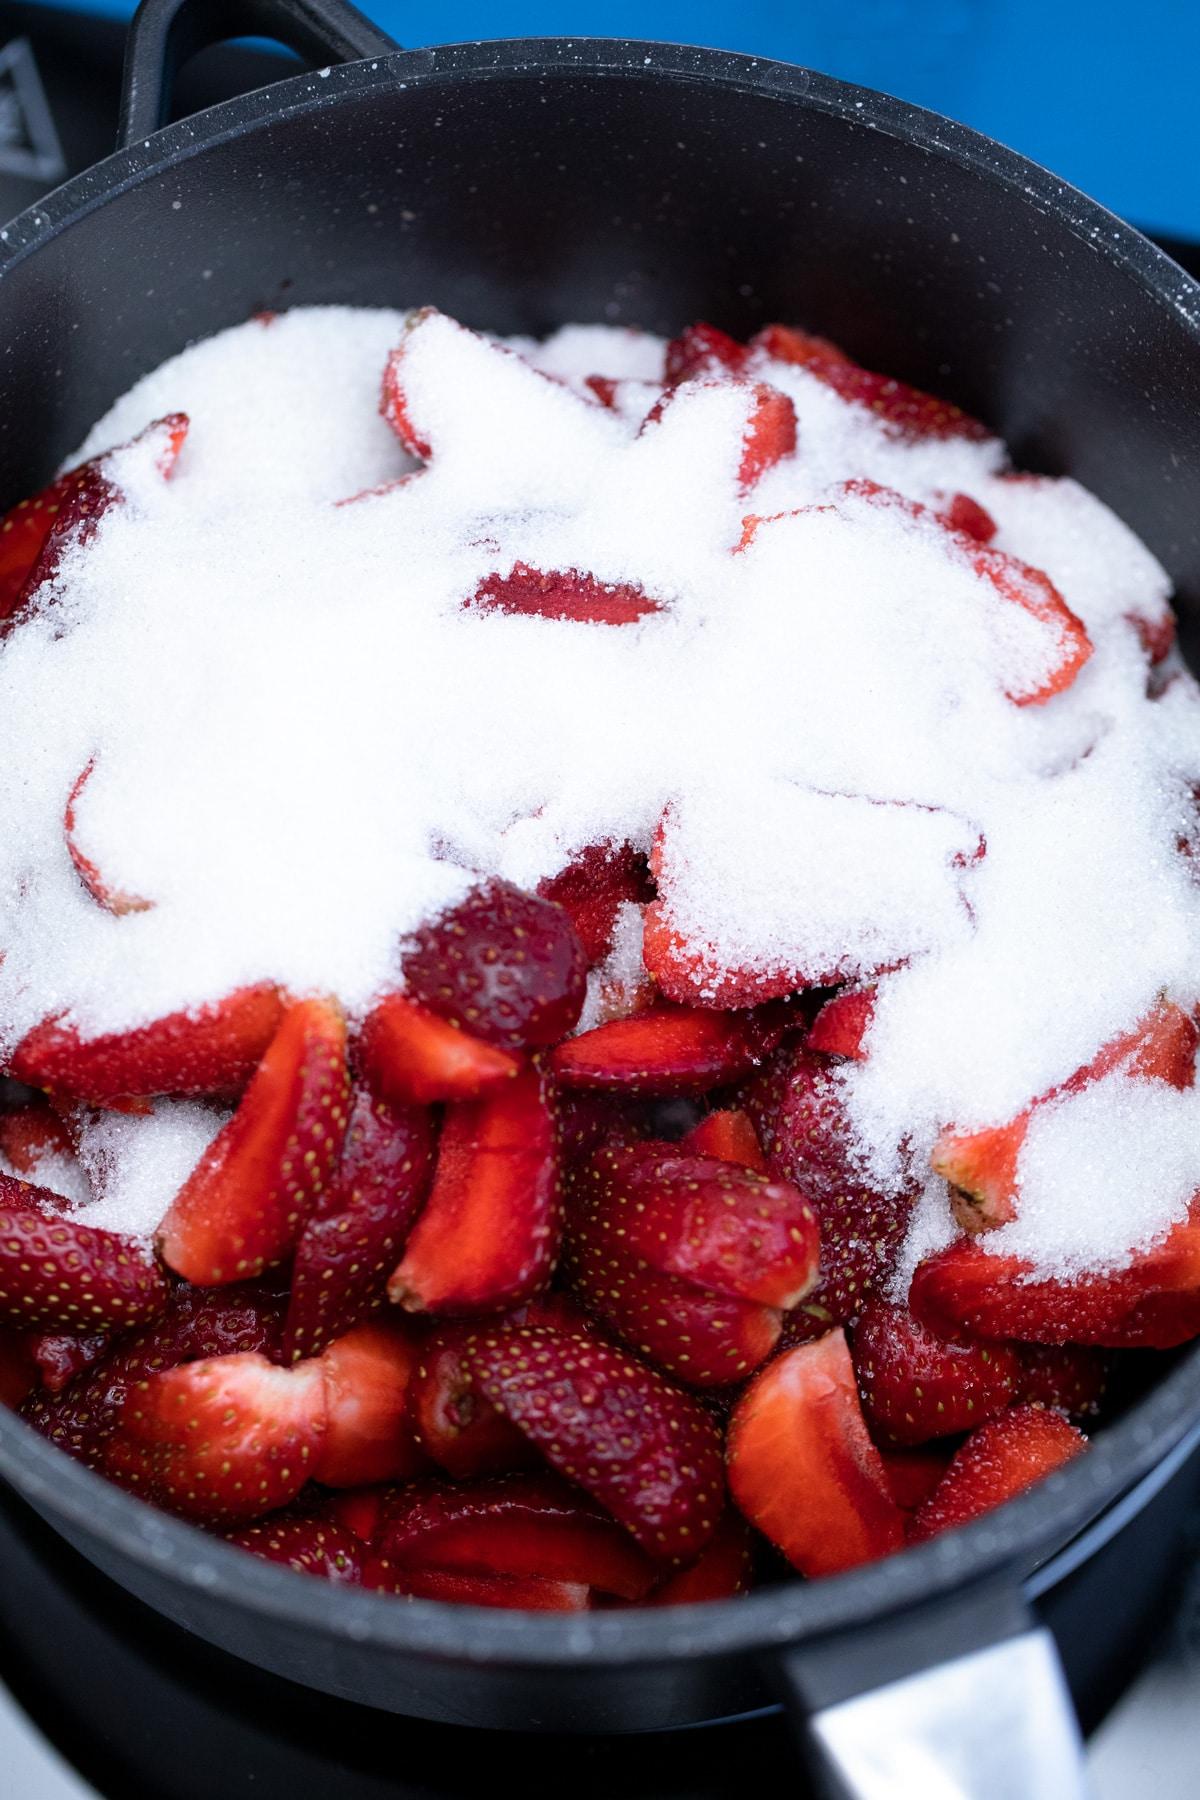 Sugar coating strawberries in large pot